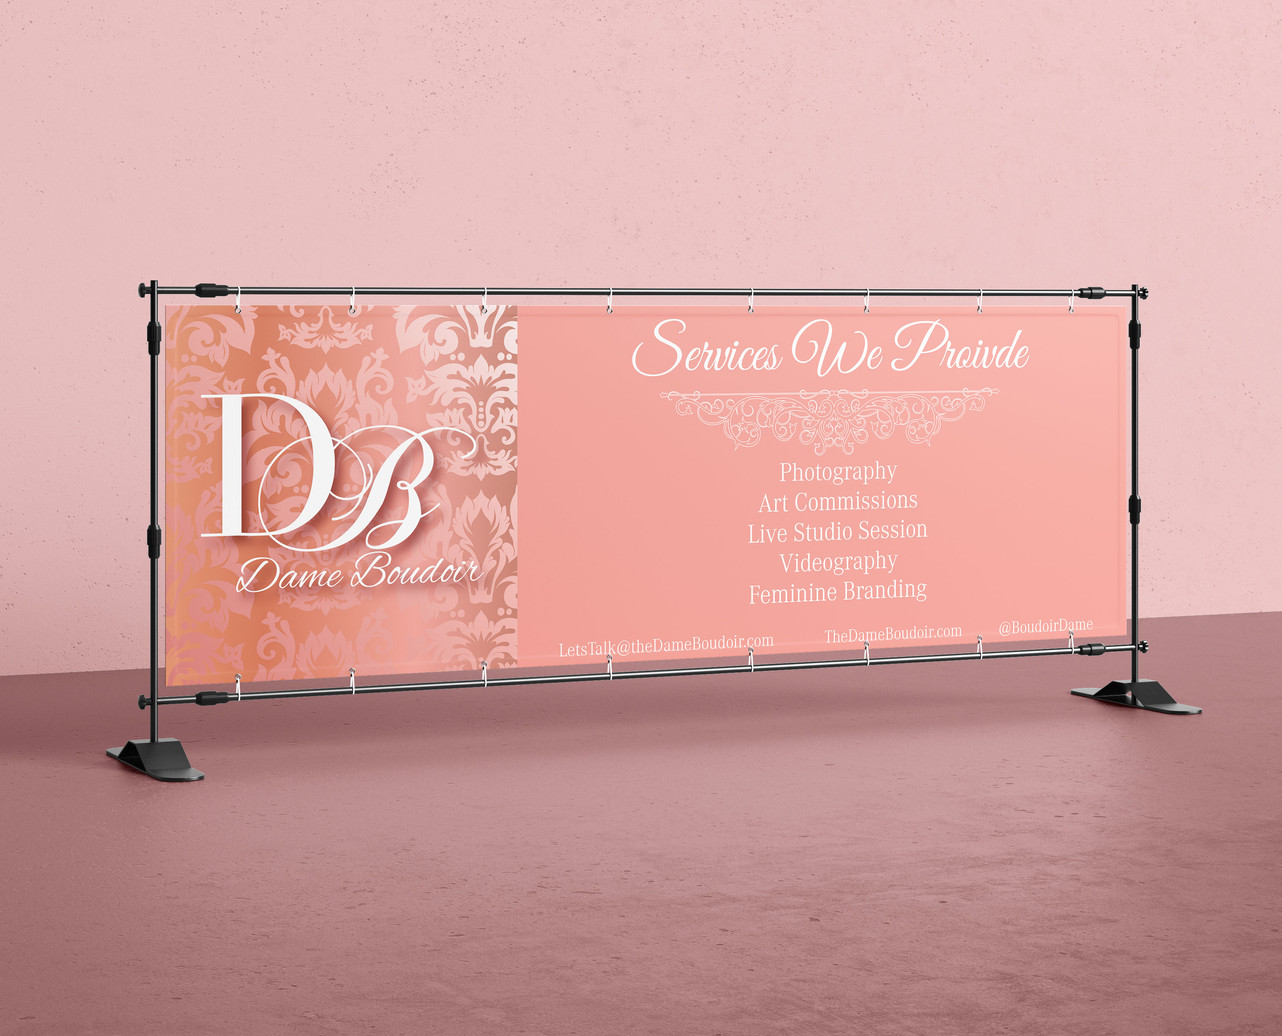 Dame Boudoir Banner Promotion